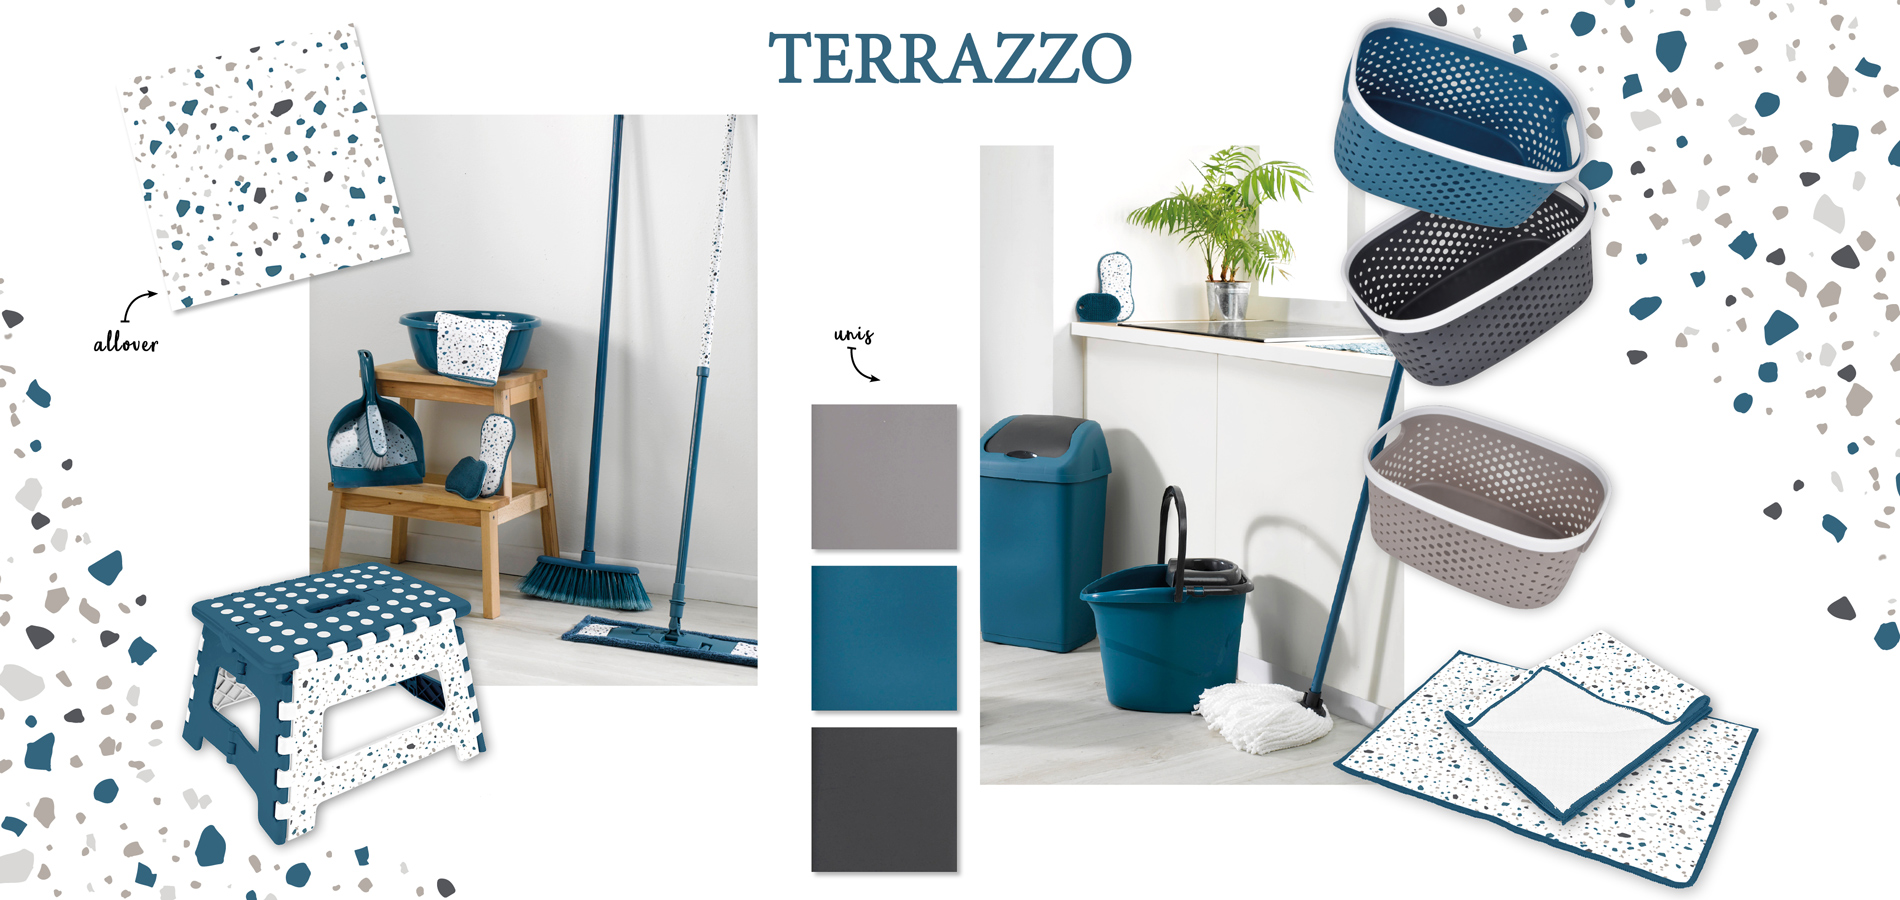 Planche de tendance_u10_homea_sept2020_Terrazzo.jpg